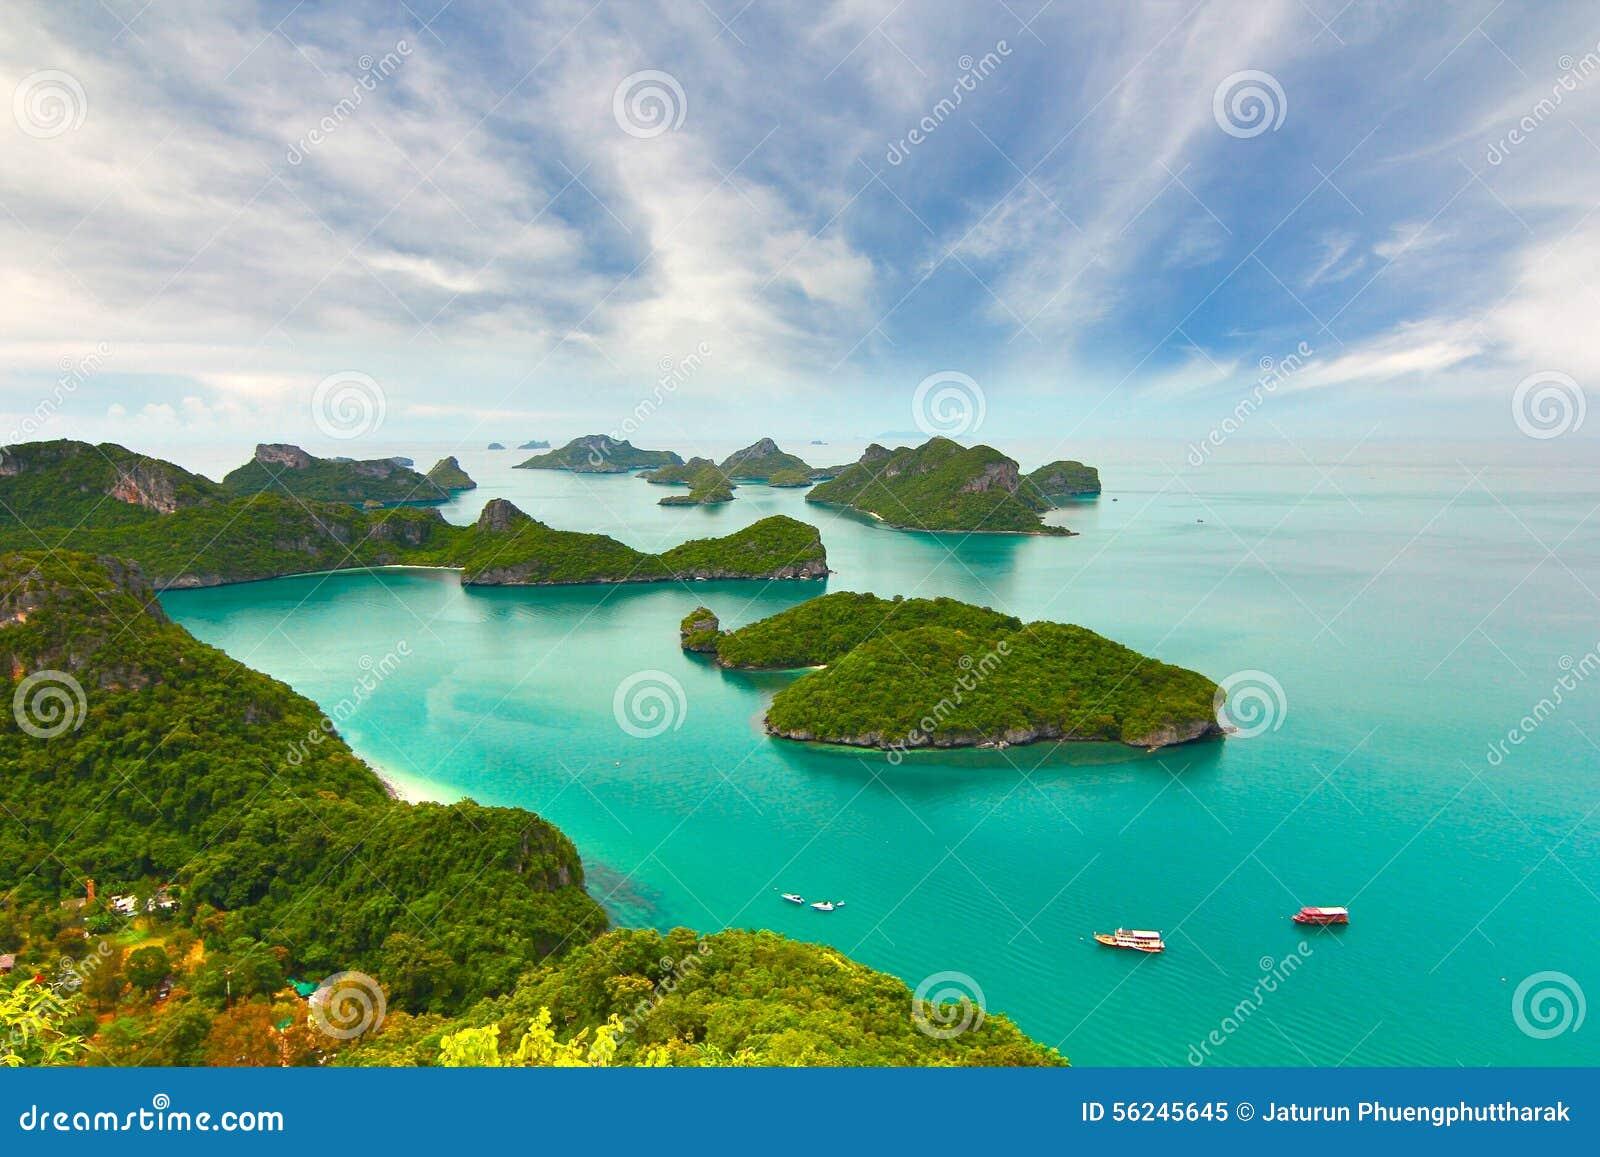 Praia tropical - Langkawi Koh Samui, Tailândia